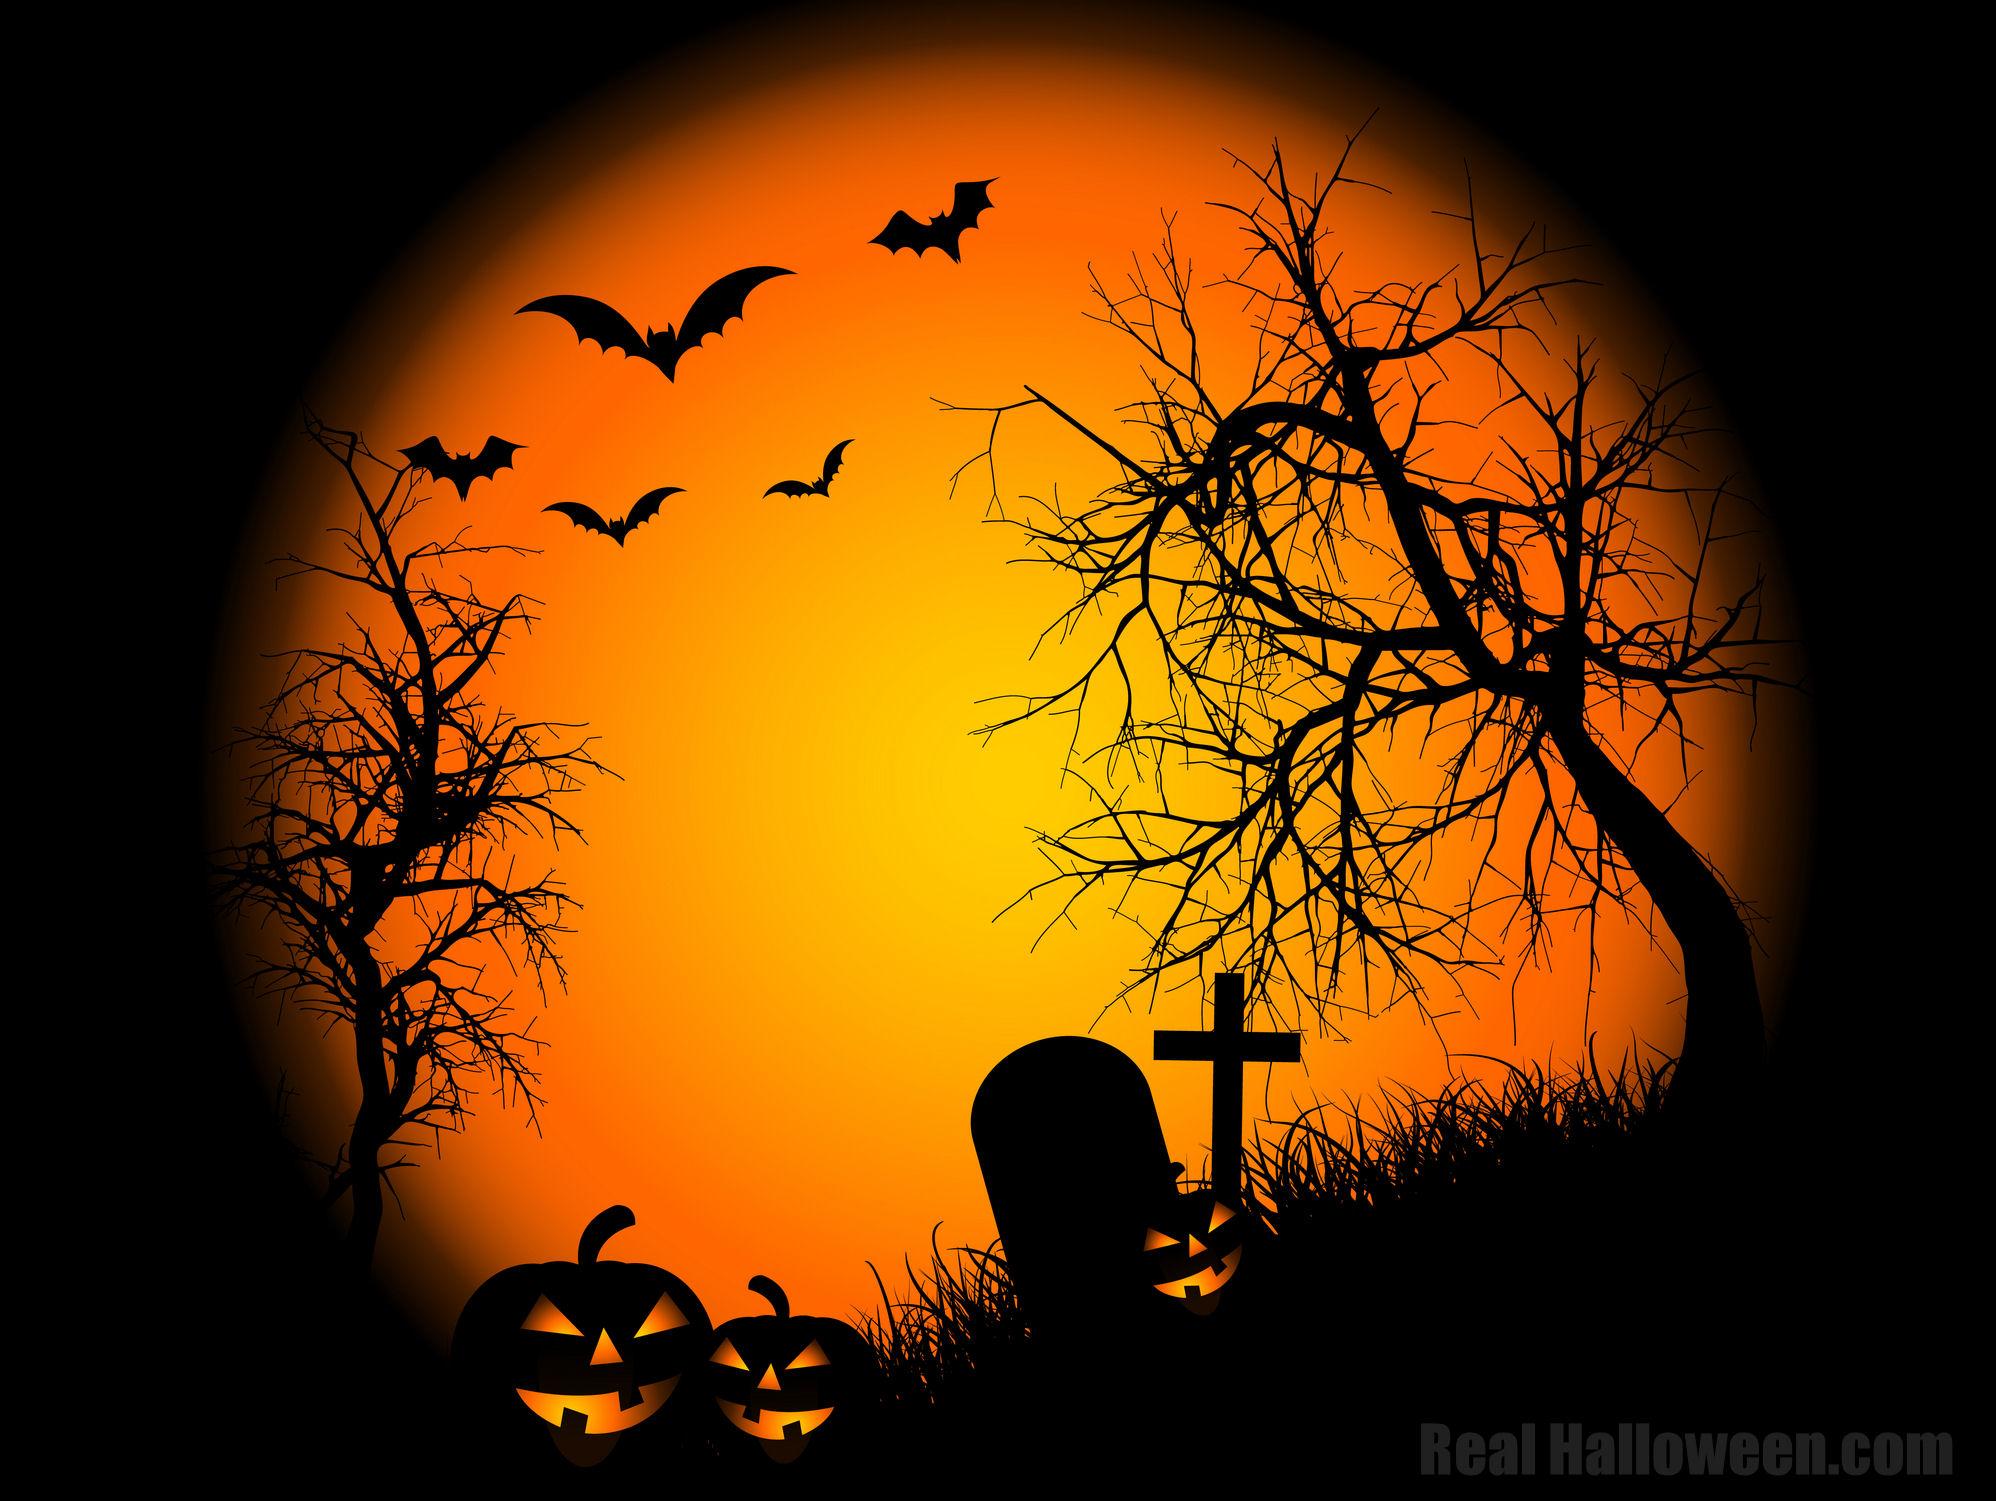 halloween desktop backgrounds Flash and Video 1996x1501